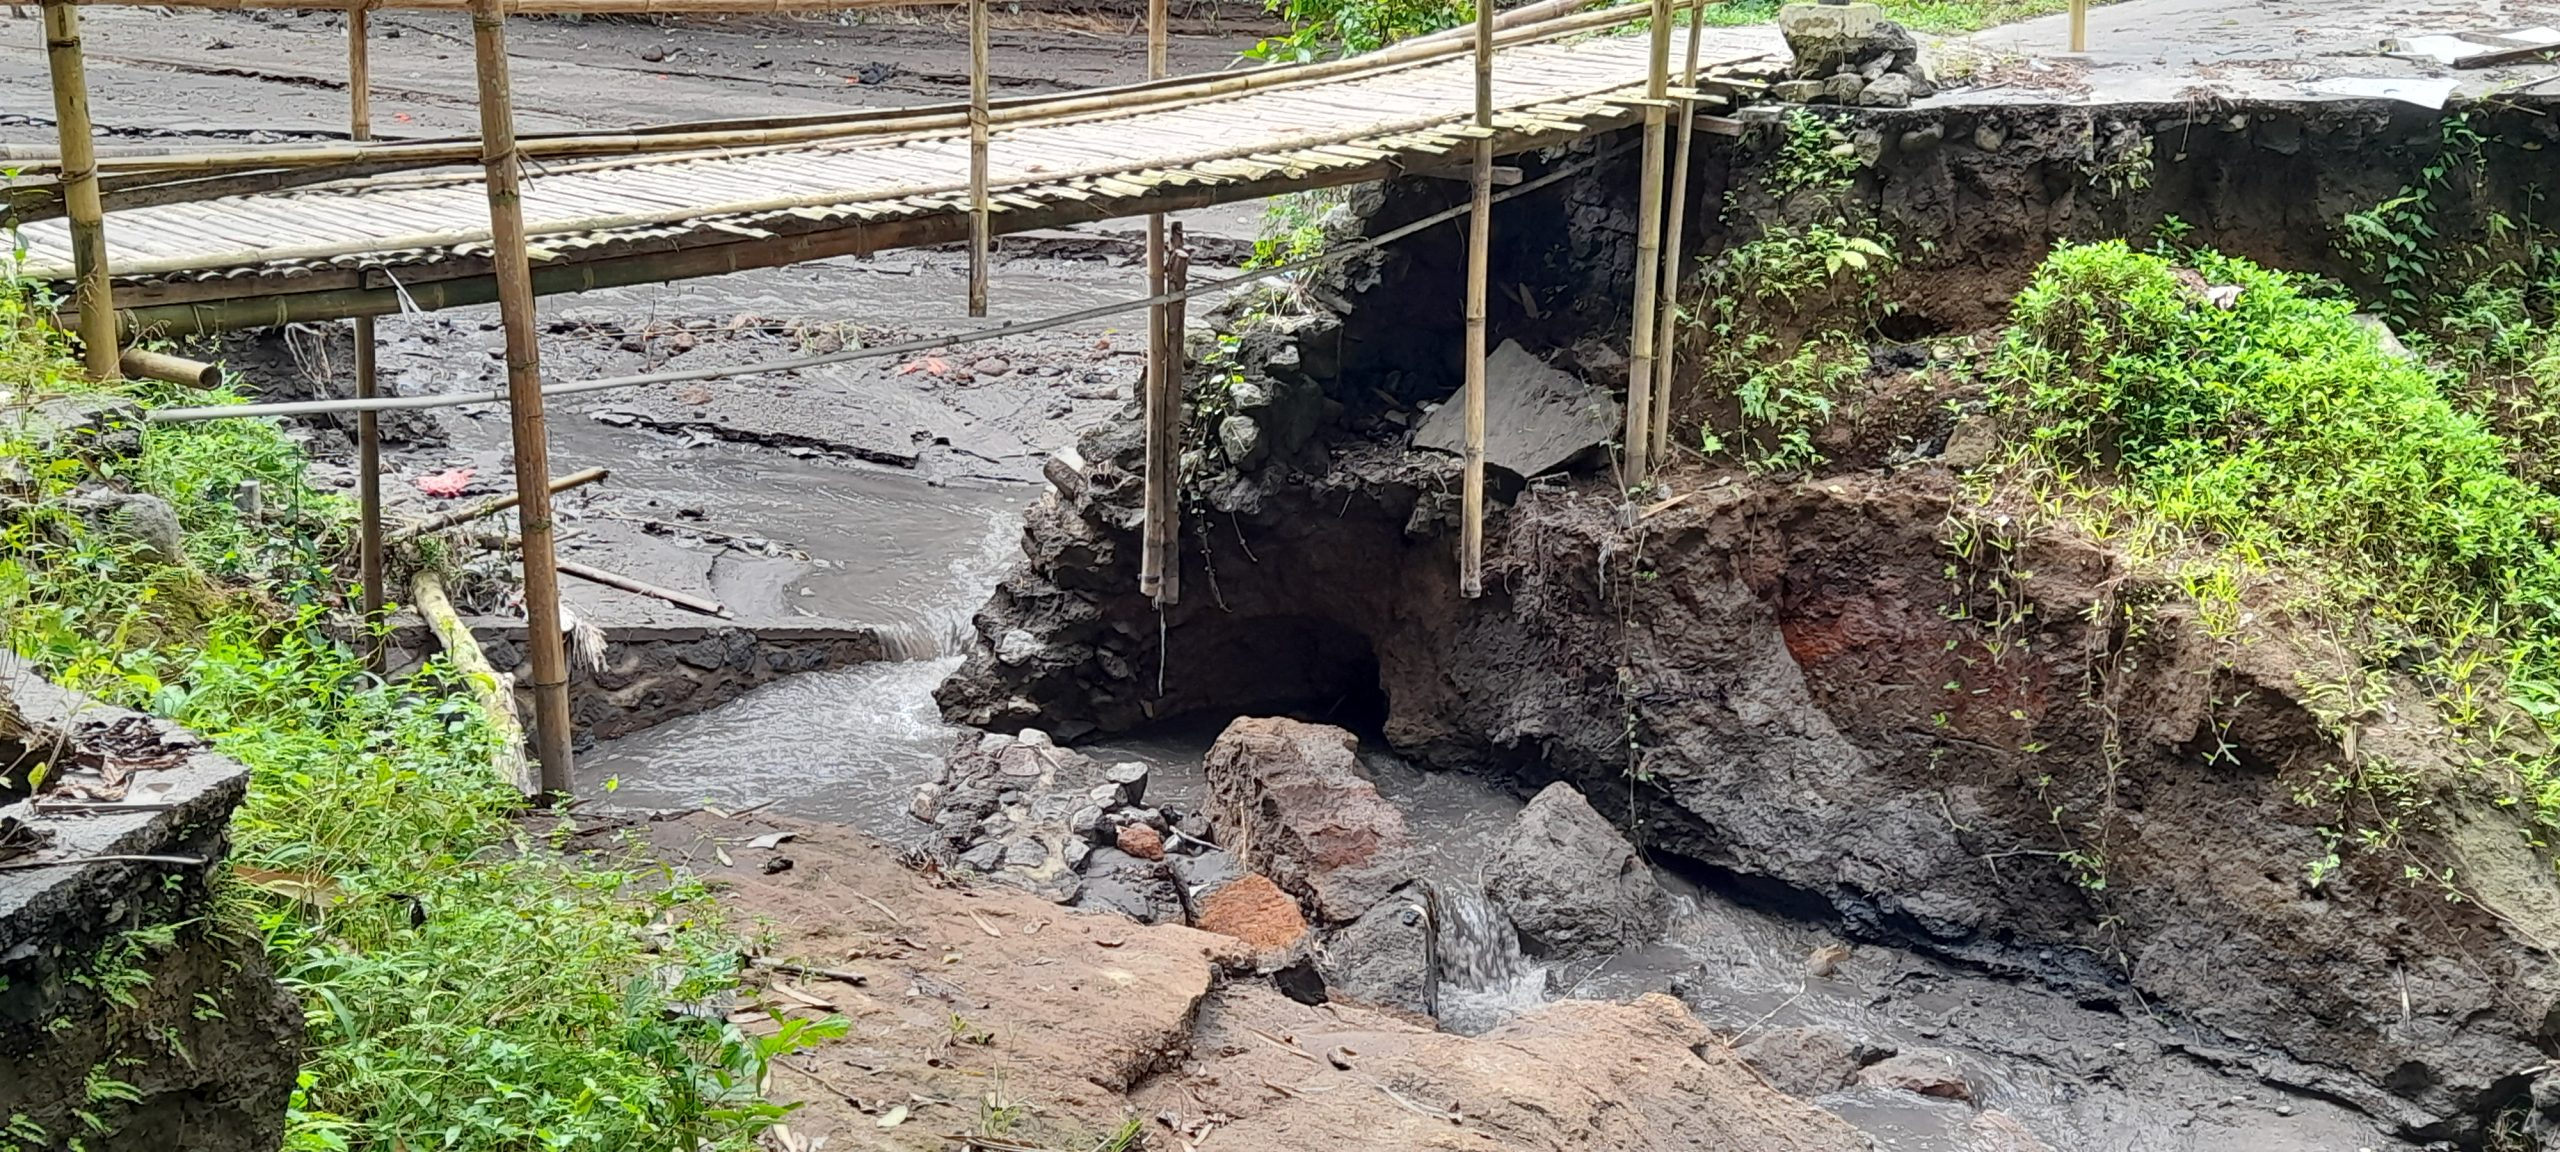 JEMBATAN bambu yang dibangun warga Lingkungan Tegallalang, Kelurahan Kawan, lagi hancur dihantam banjir bandang. Foto: ist